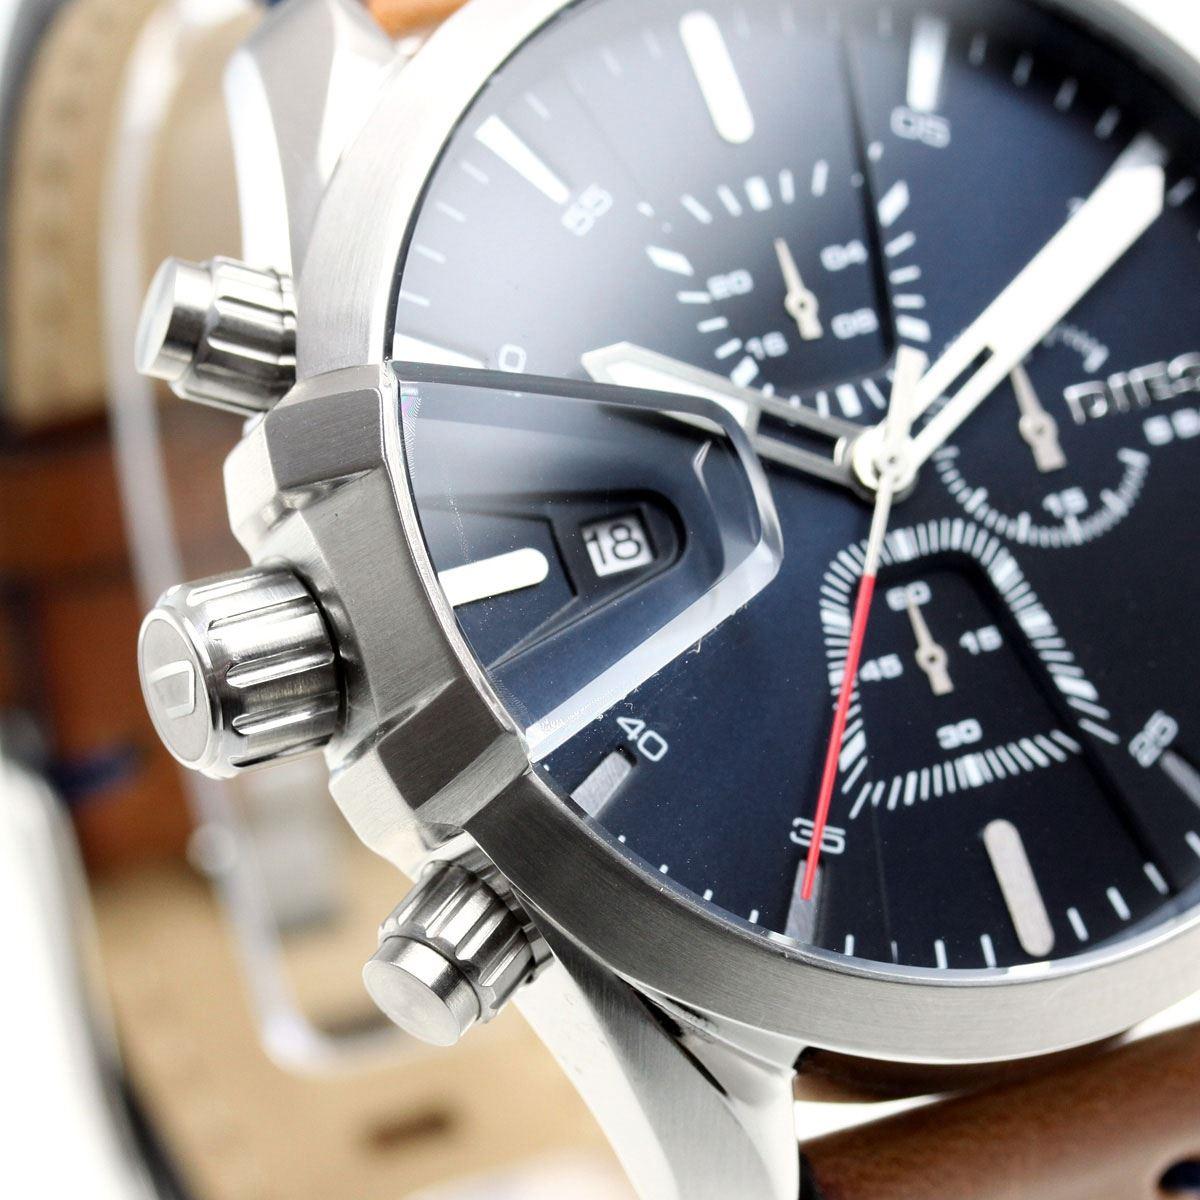 764570a08167 Reloj Diesel MS9 DZ4470 Cronometro Acero Inoxidable Correa de Cuero ...